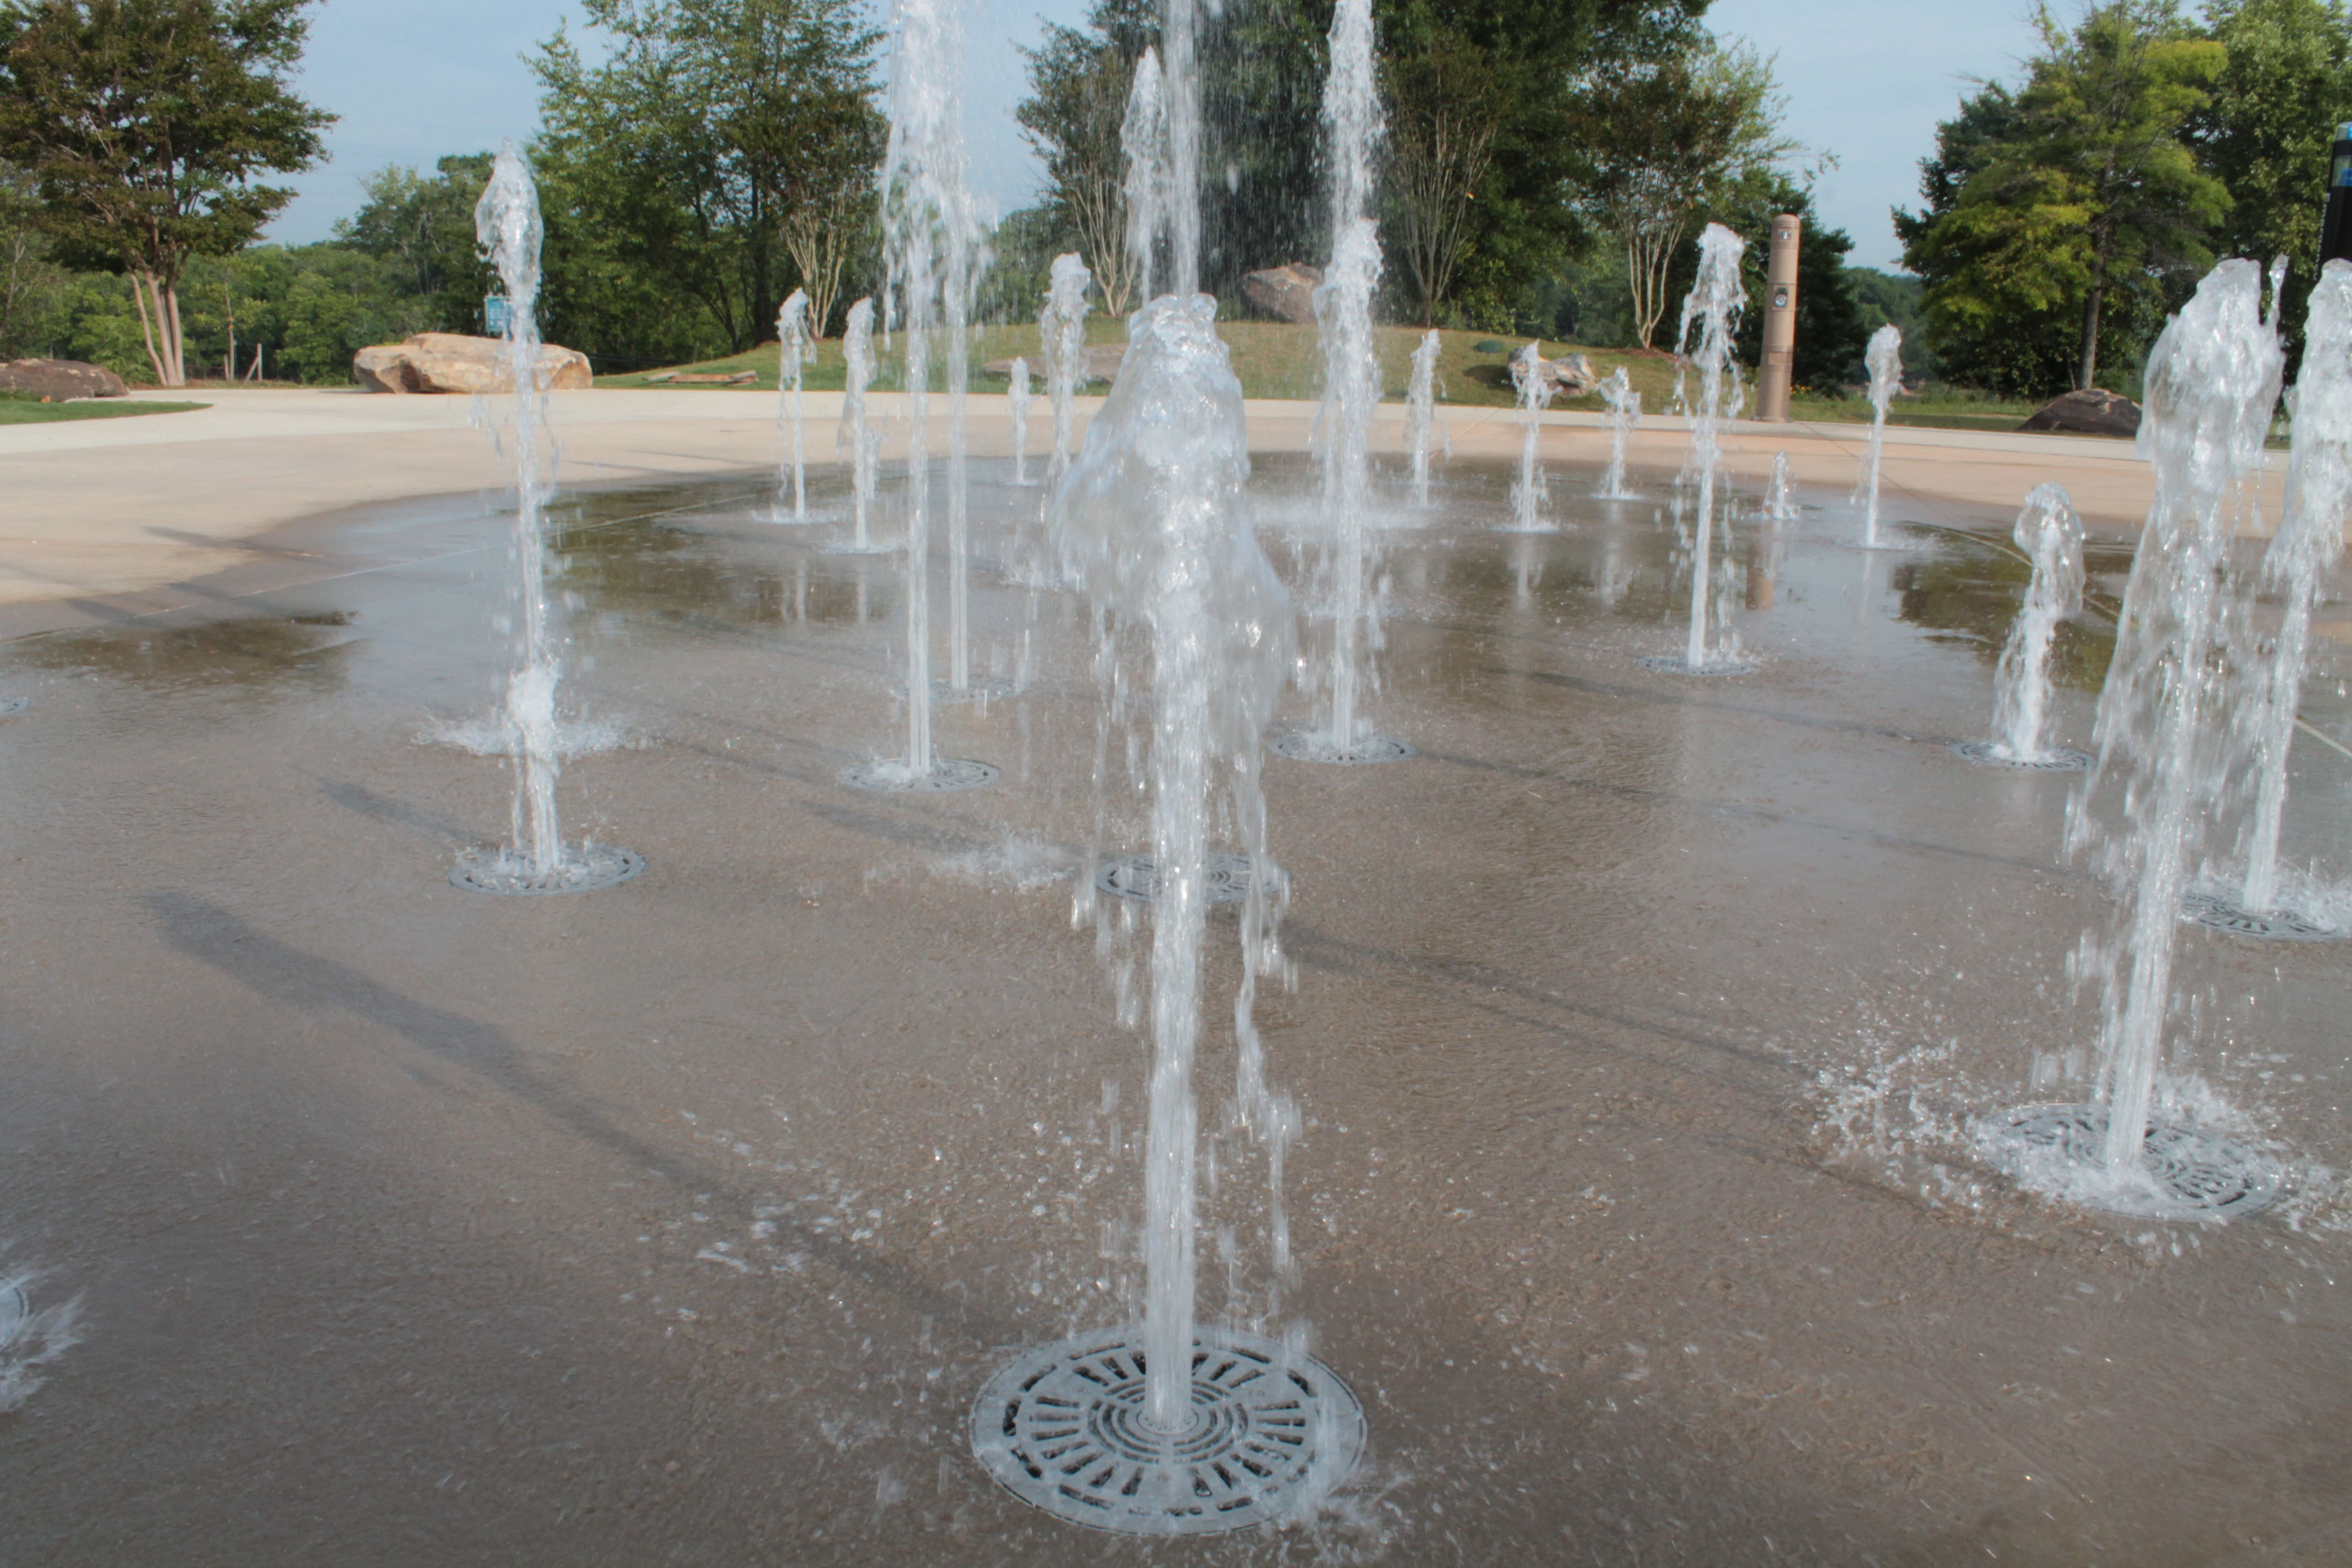 Dry deck fountain, 10th Street